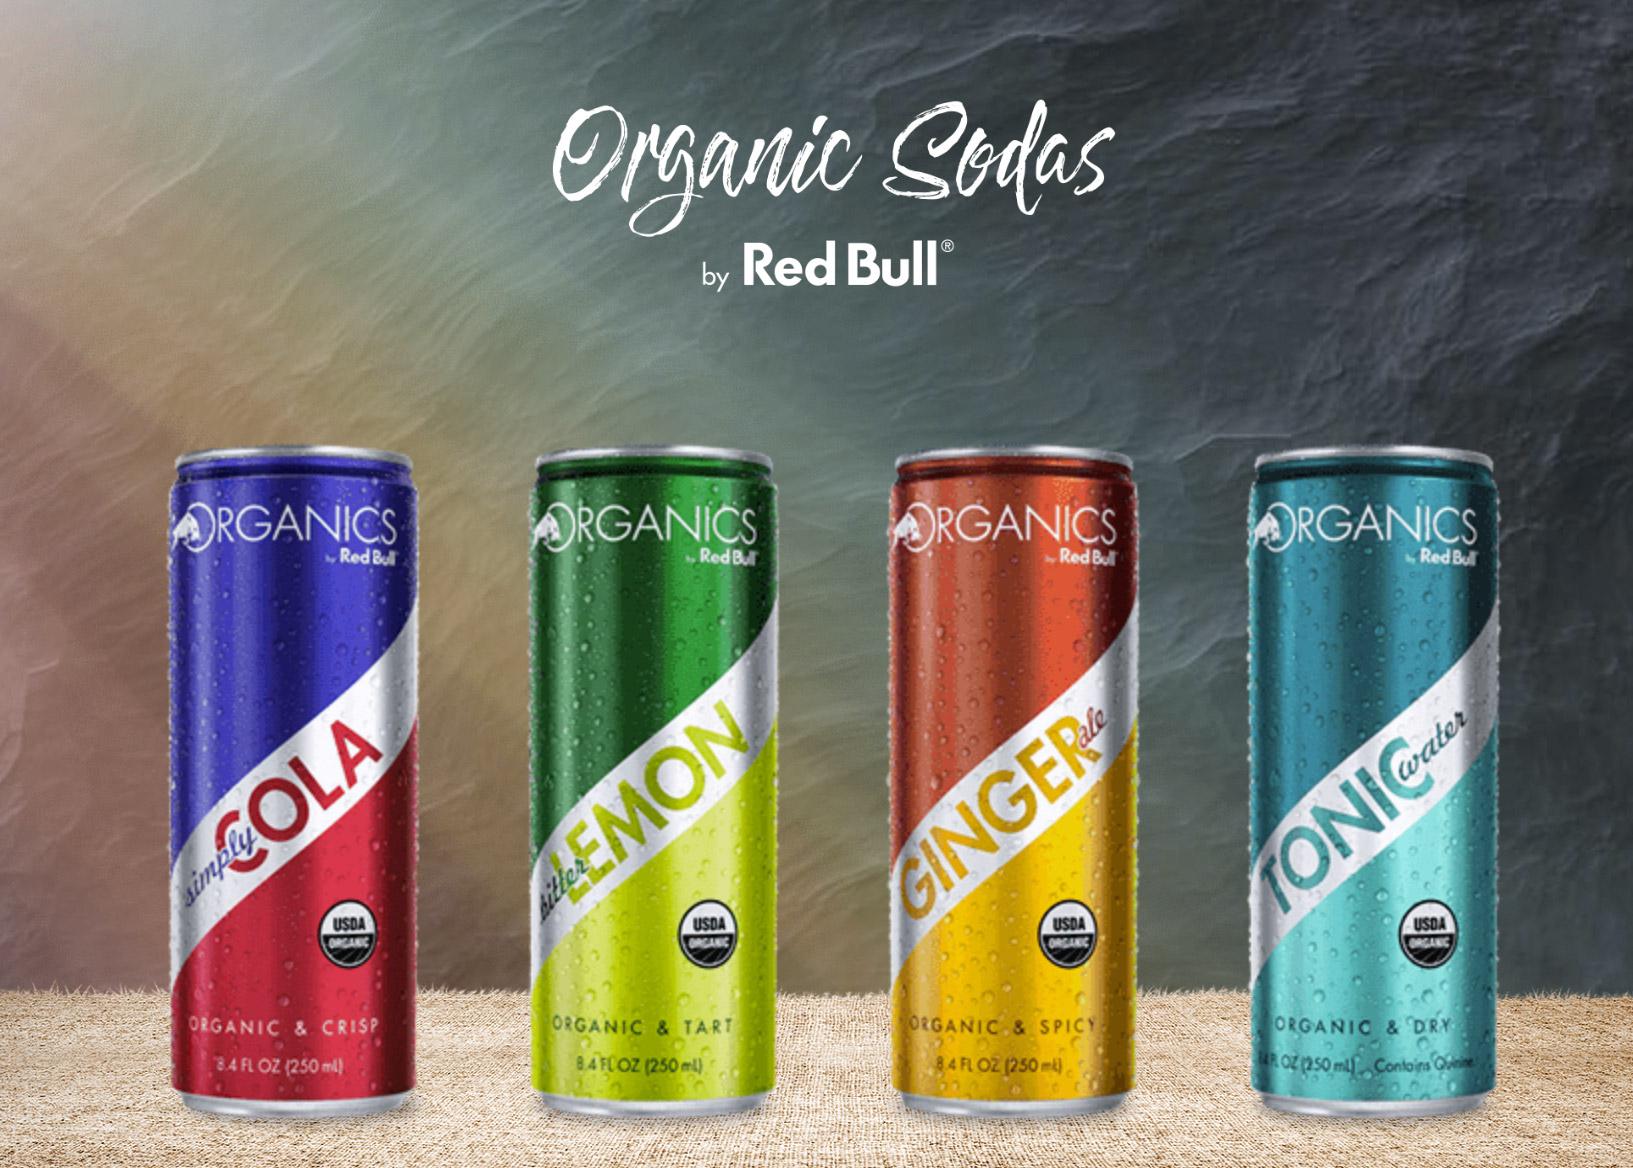 red bull organics gluten free